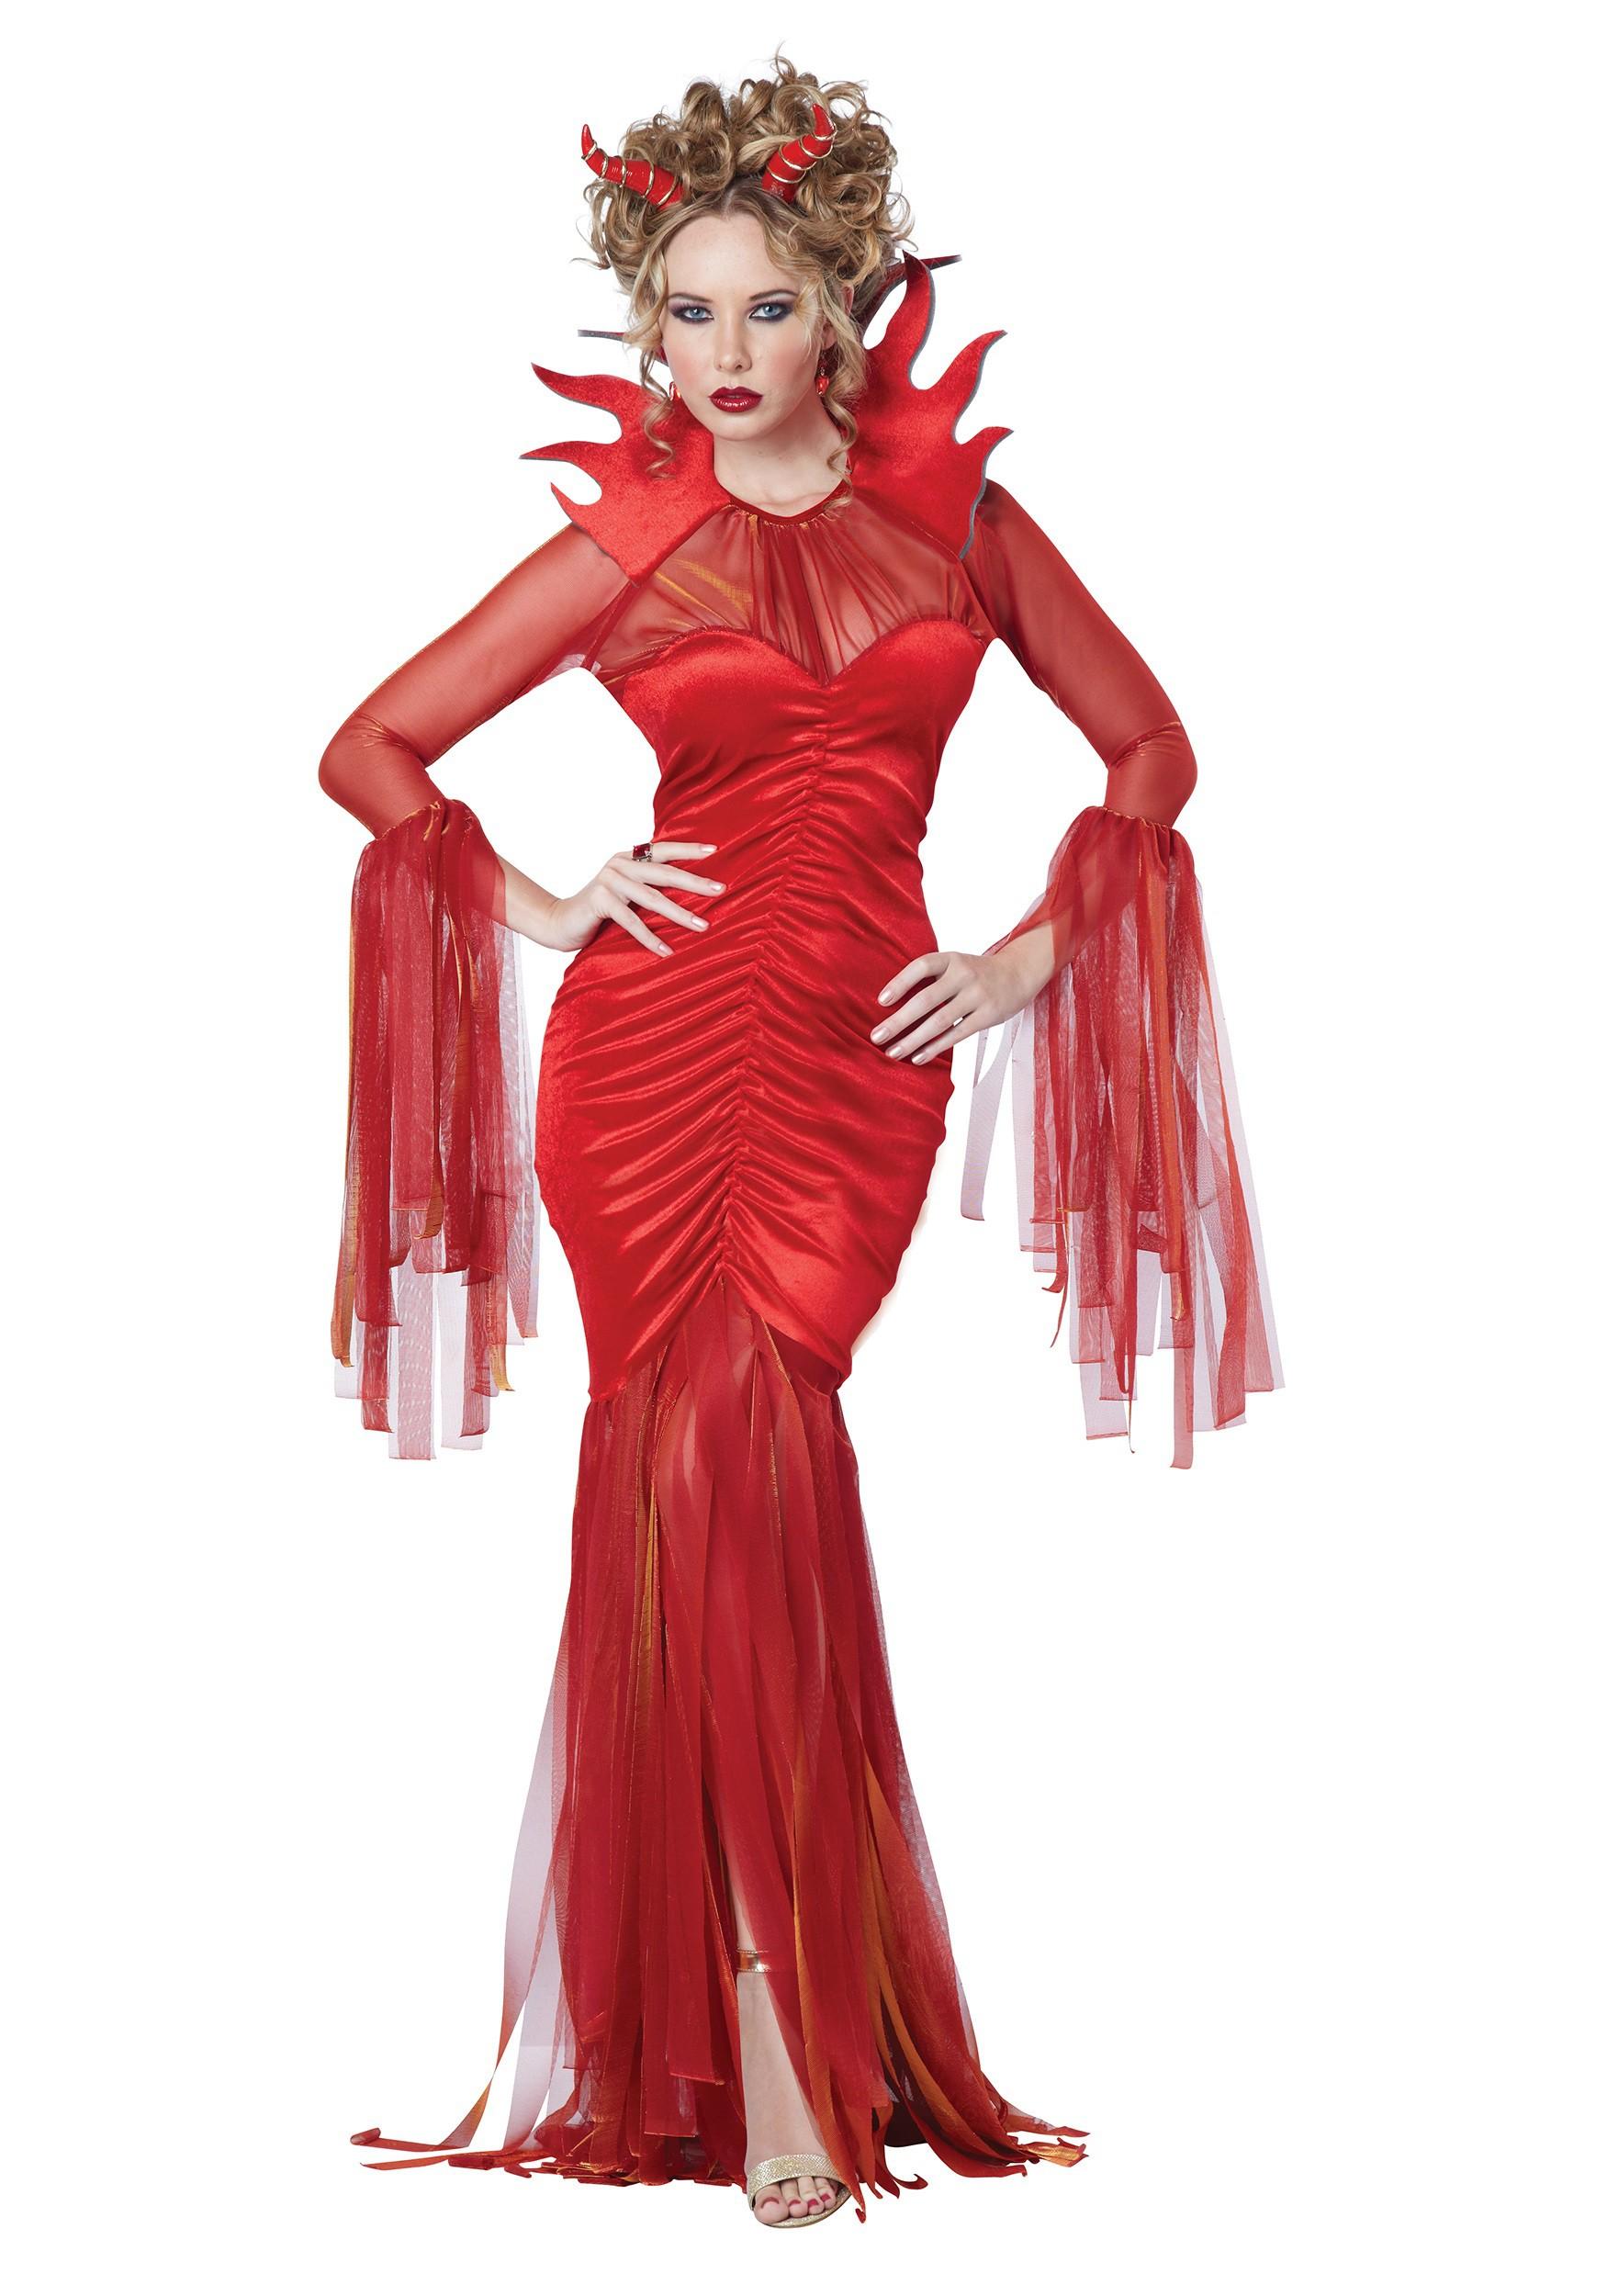 Devil Costumes & Sexy Devil Dresses - HalloweenCostumes.com